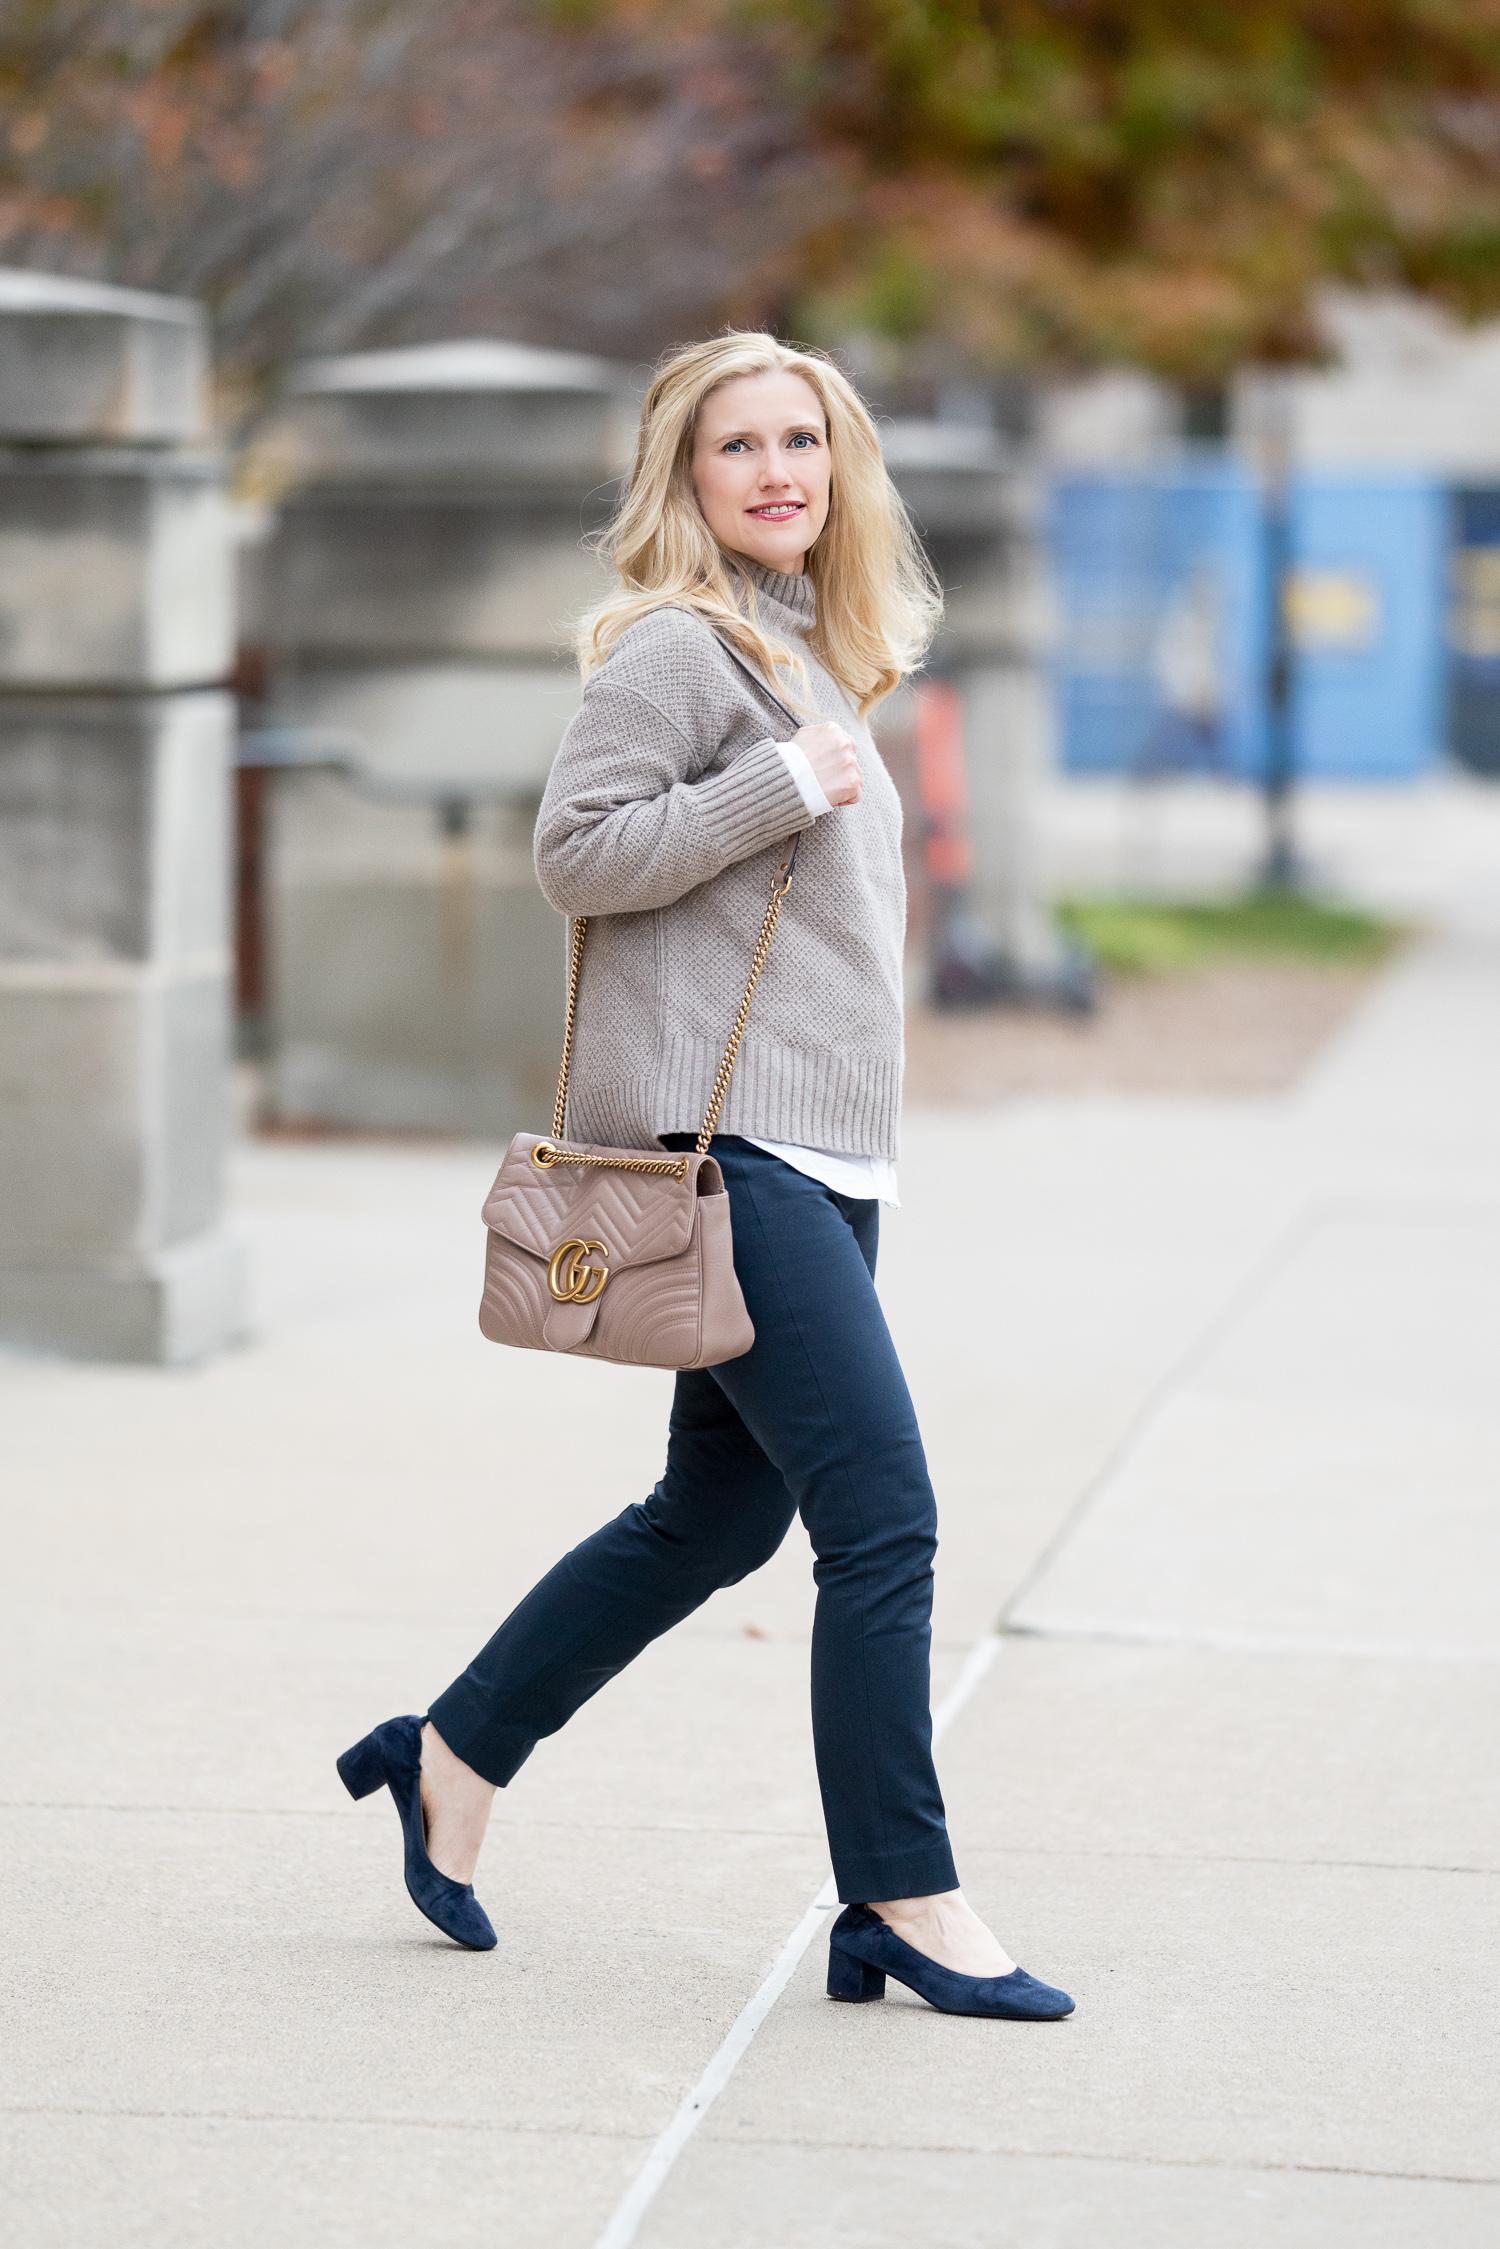 Petite Fashion Blog | Everlane ReCashmere Stroopwafel Turtleneck | Everlane Day Heel | Everlane Side Zip Work Pants